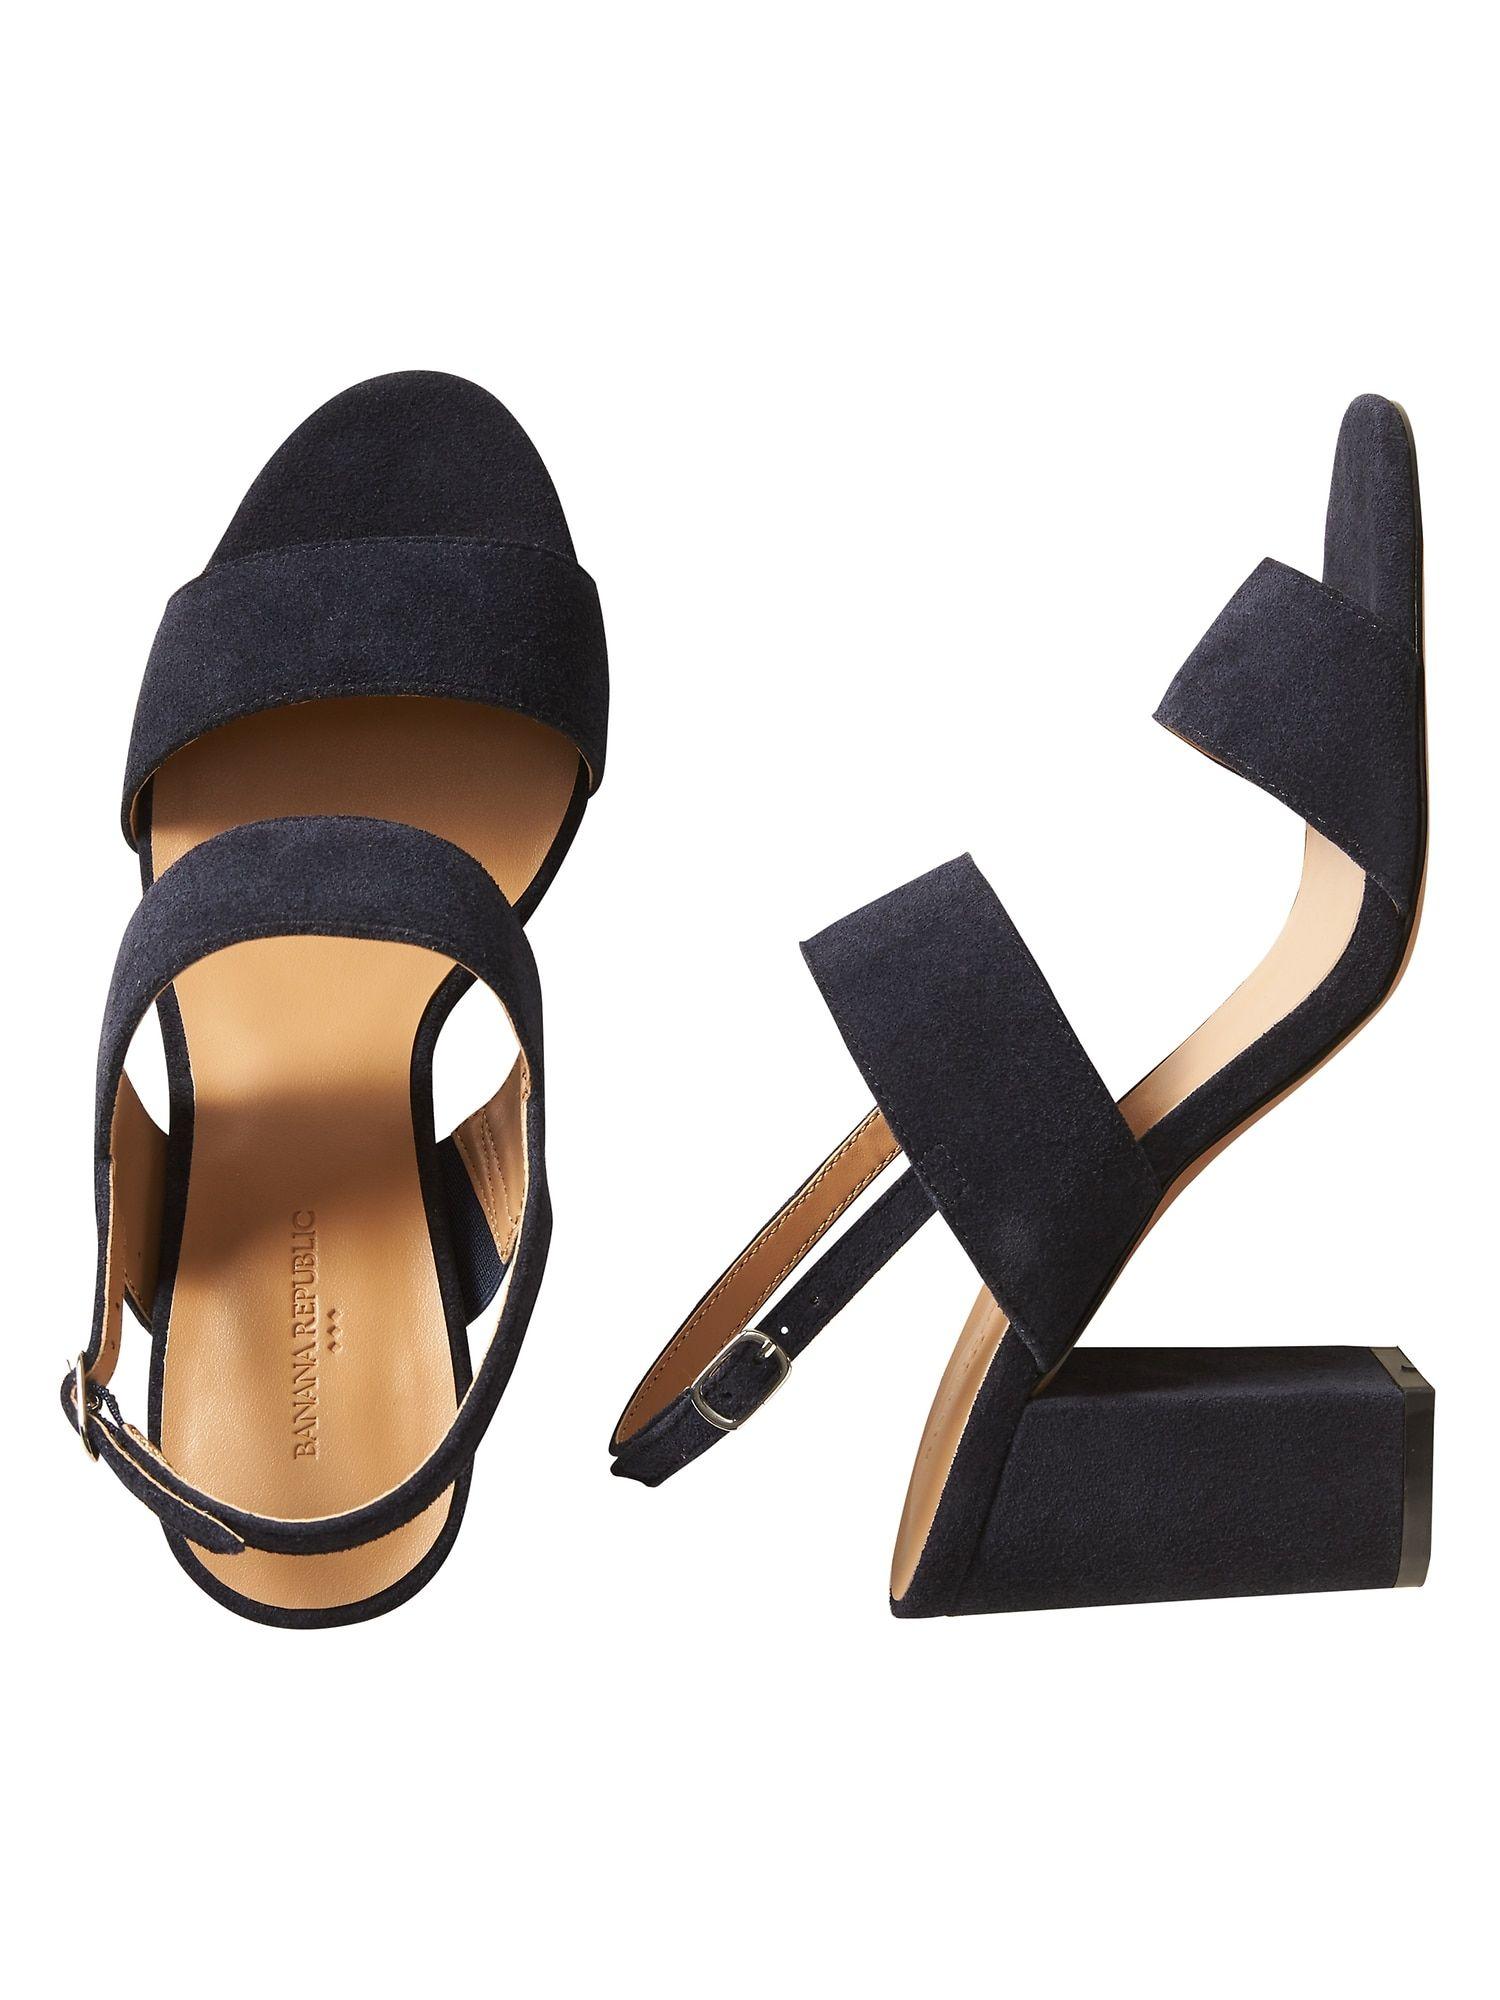 2b3d42fbfdb Double Strap Block-Heel Sandal